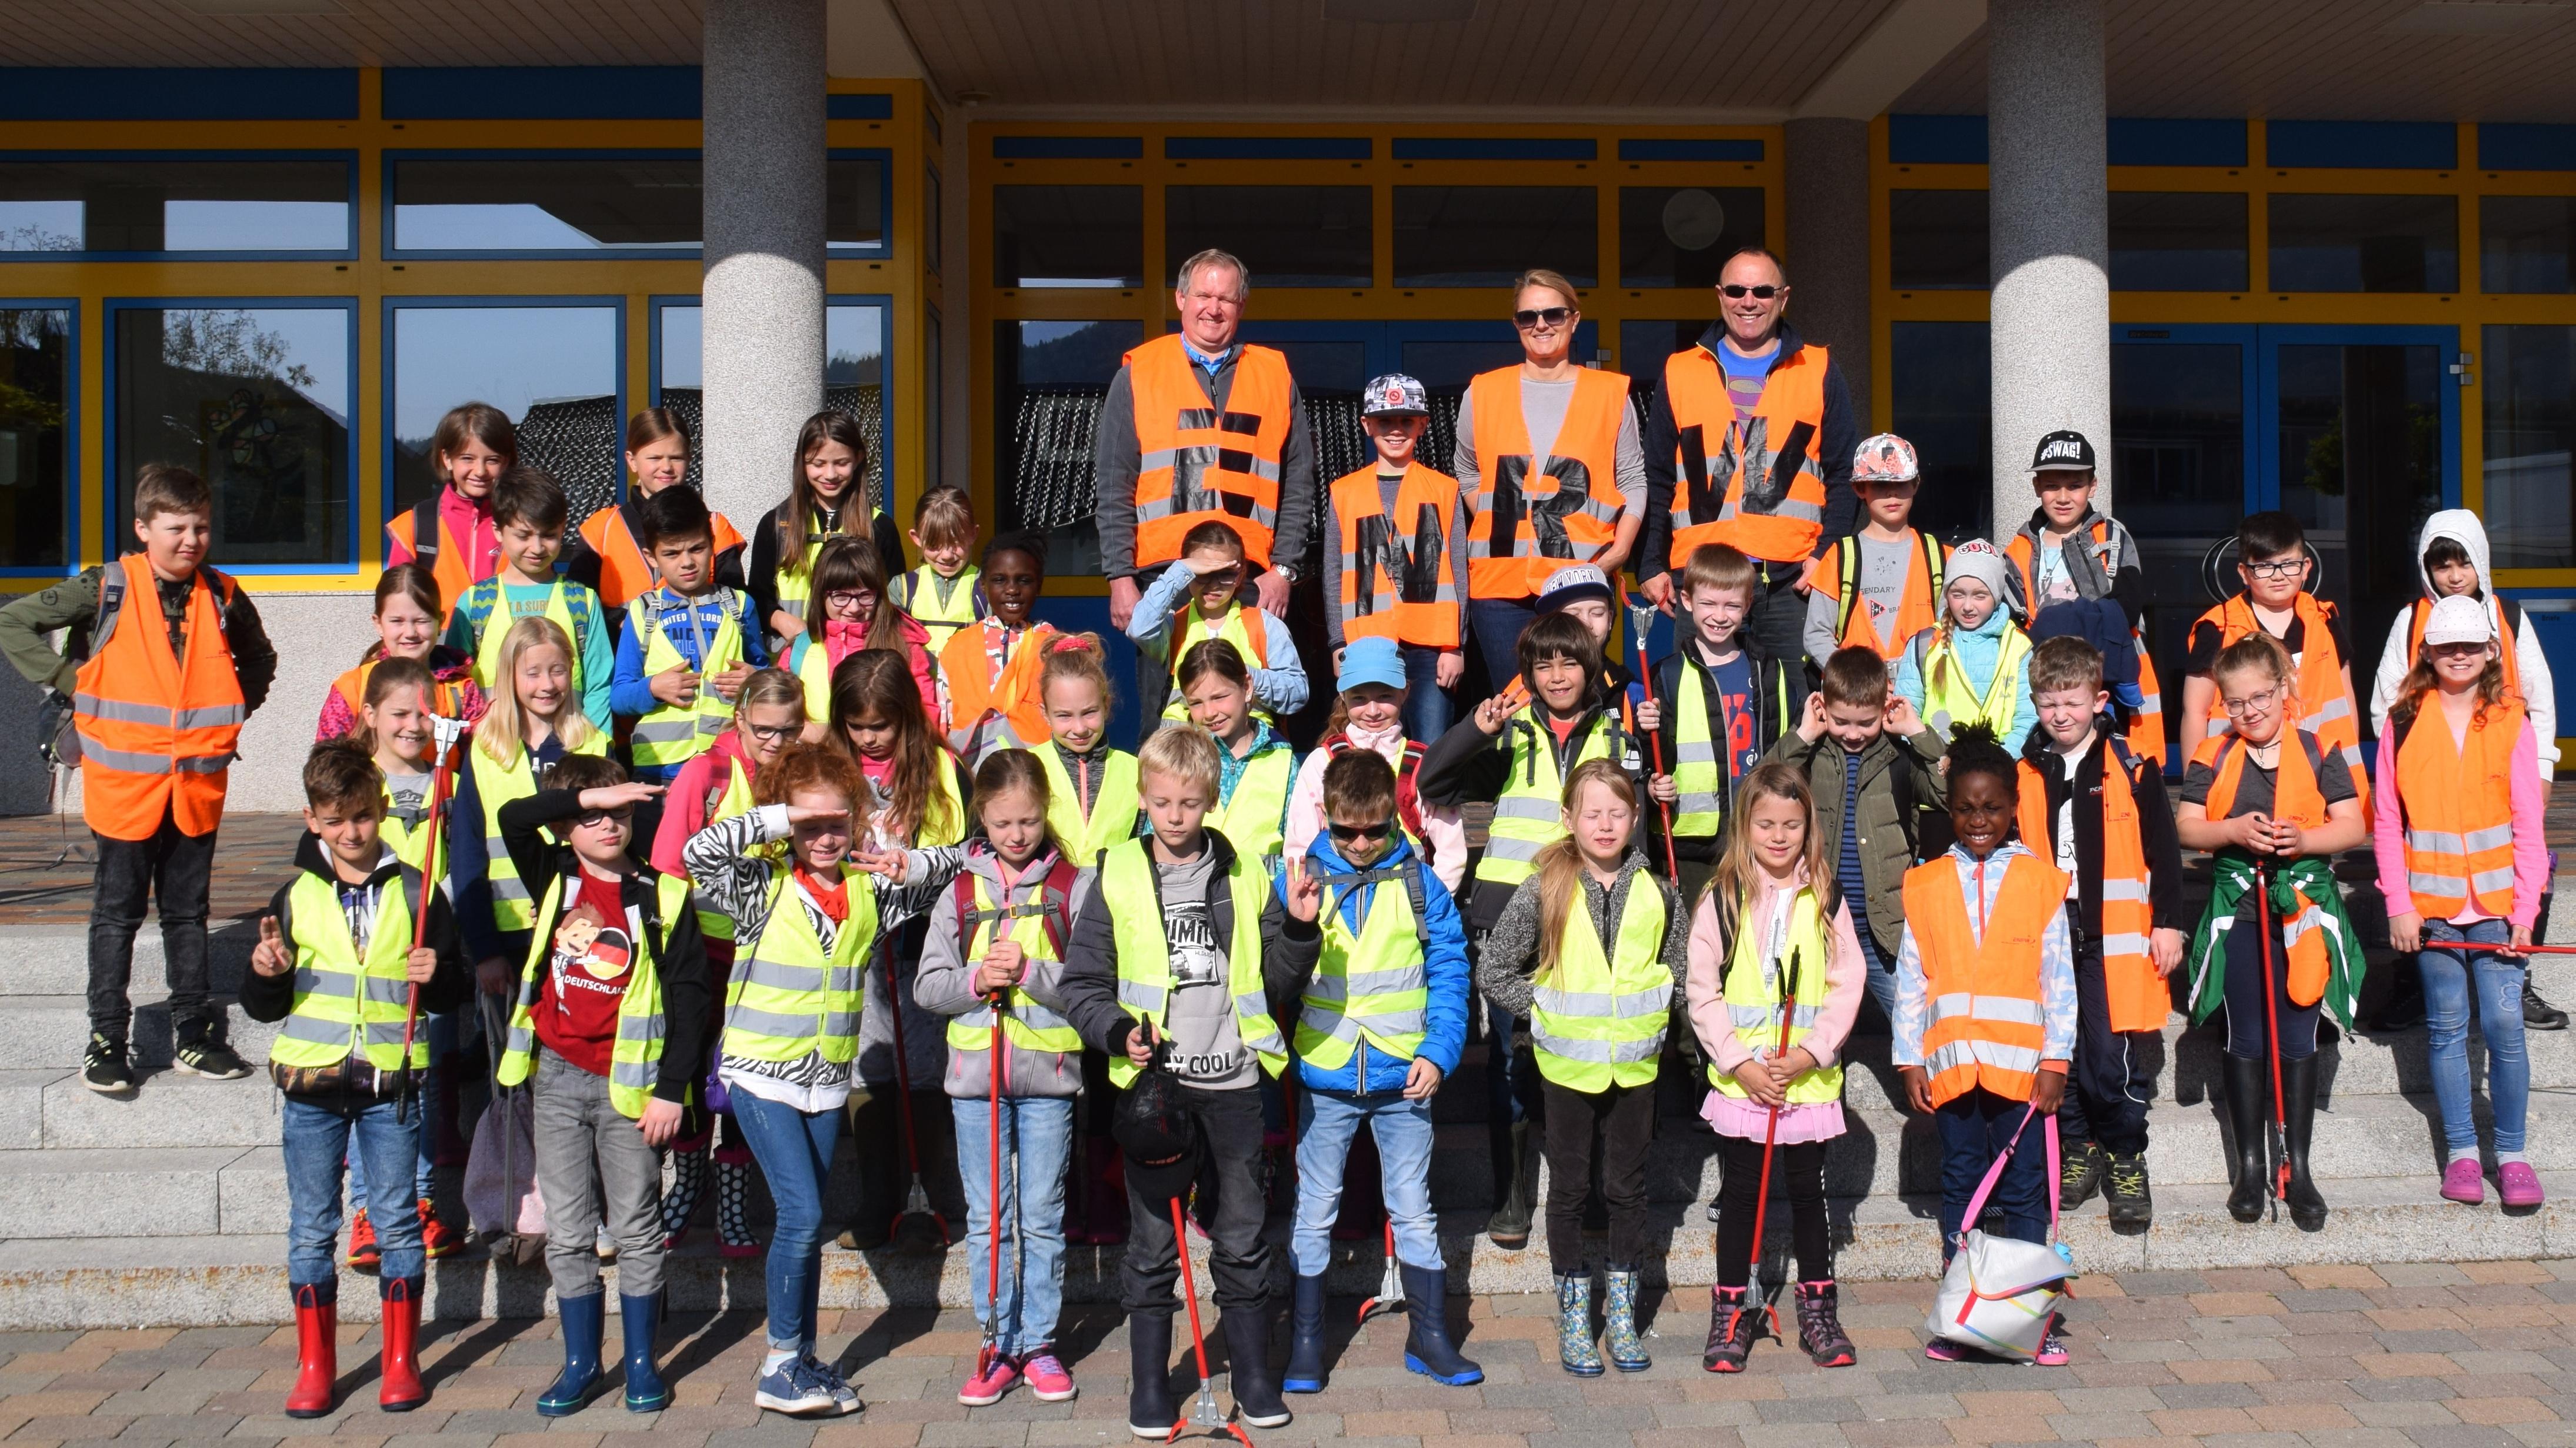 Schüler der Spaichinger Rupert-Mayer-Schule engagierten sich bei der ENRW-Dorfputzete 2019.